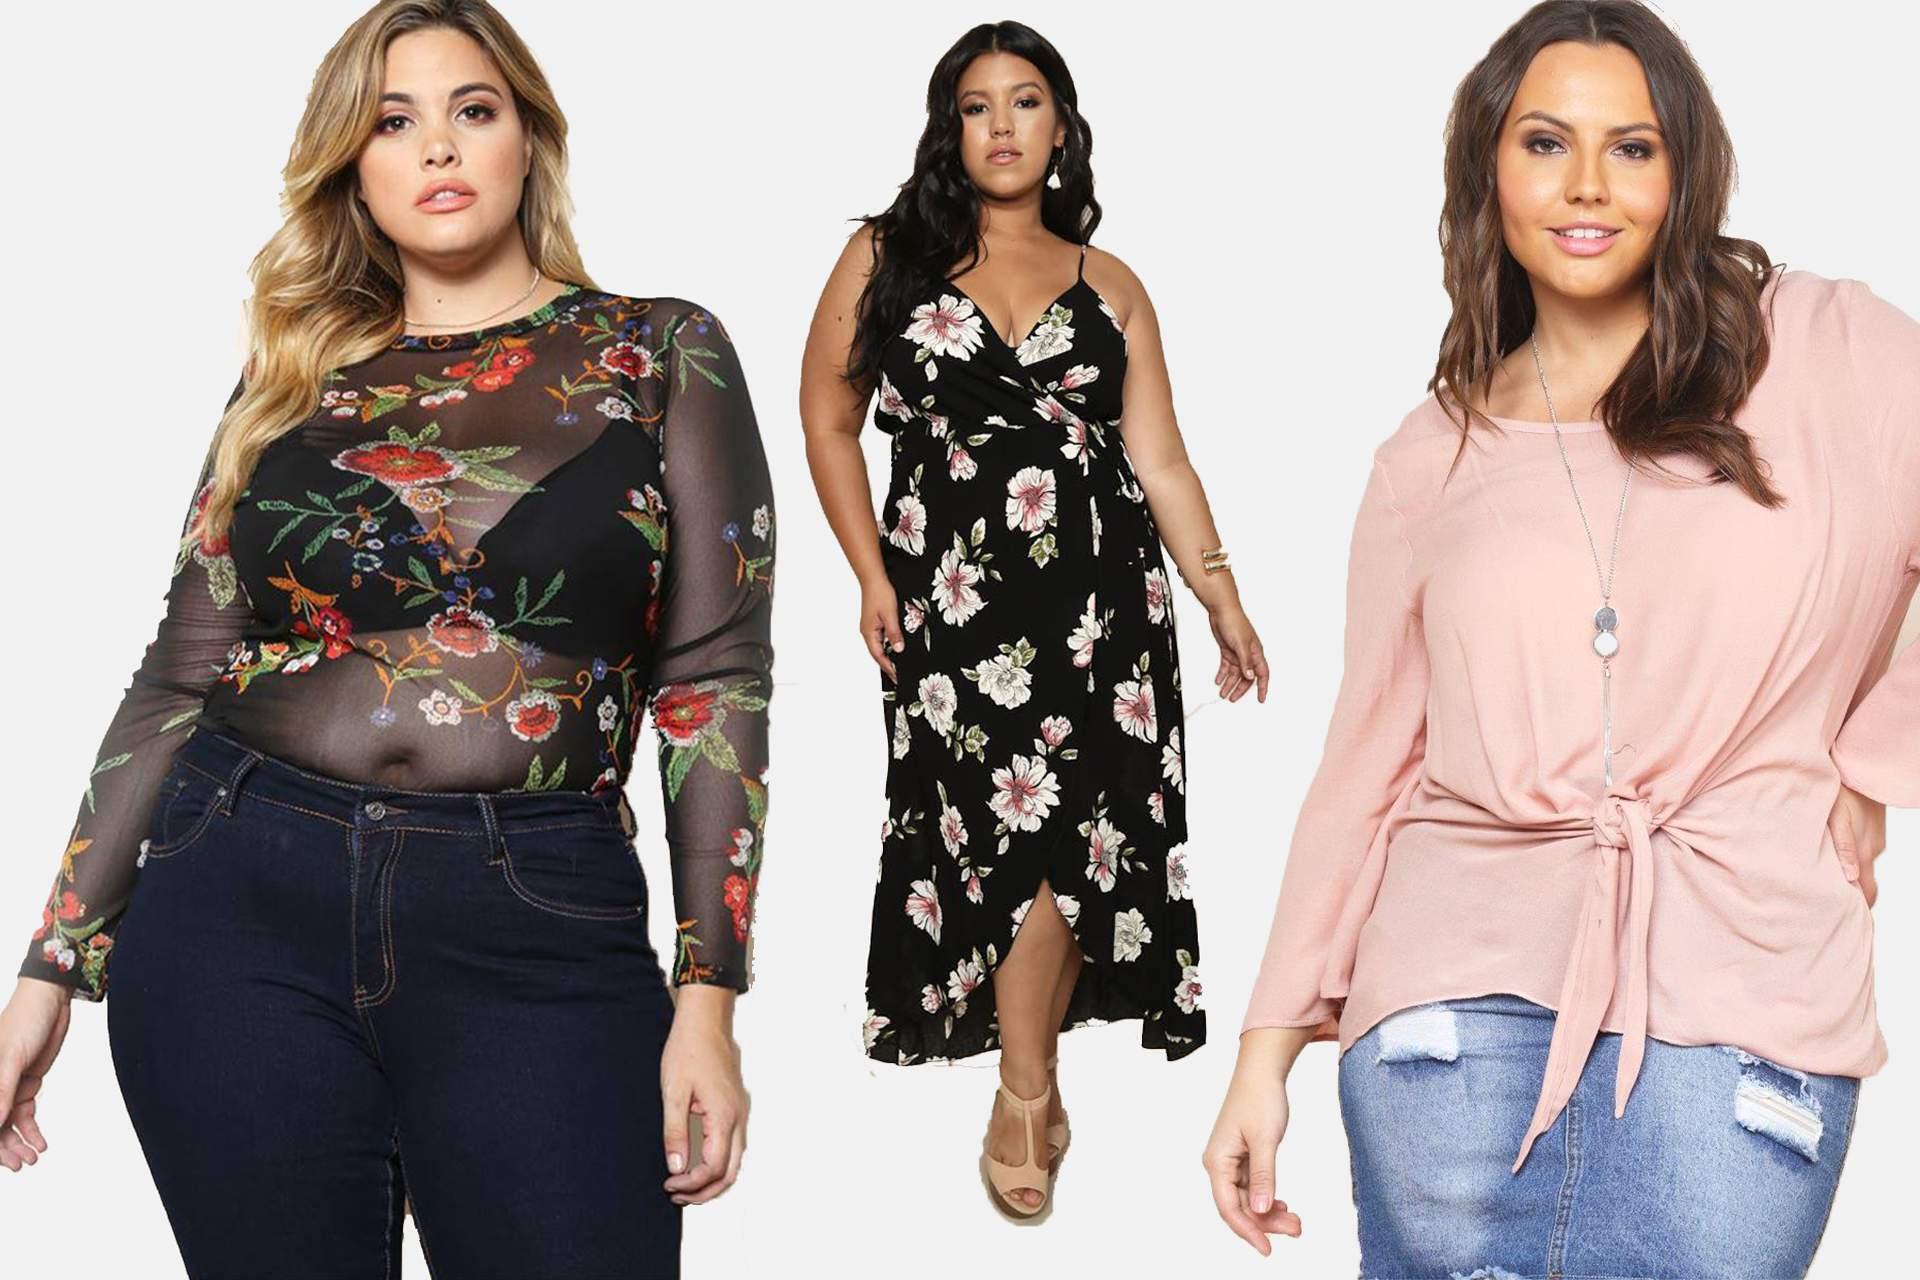 plus size boutiques, GS Love, Chic and Curvy, Curvy girl lingerie, Standout style boutique, Bailey Creek boutique